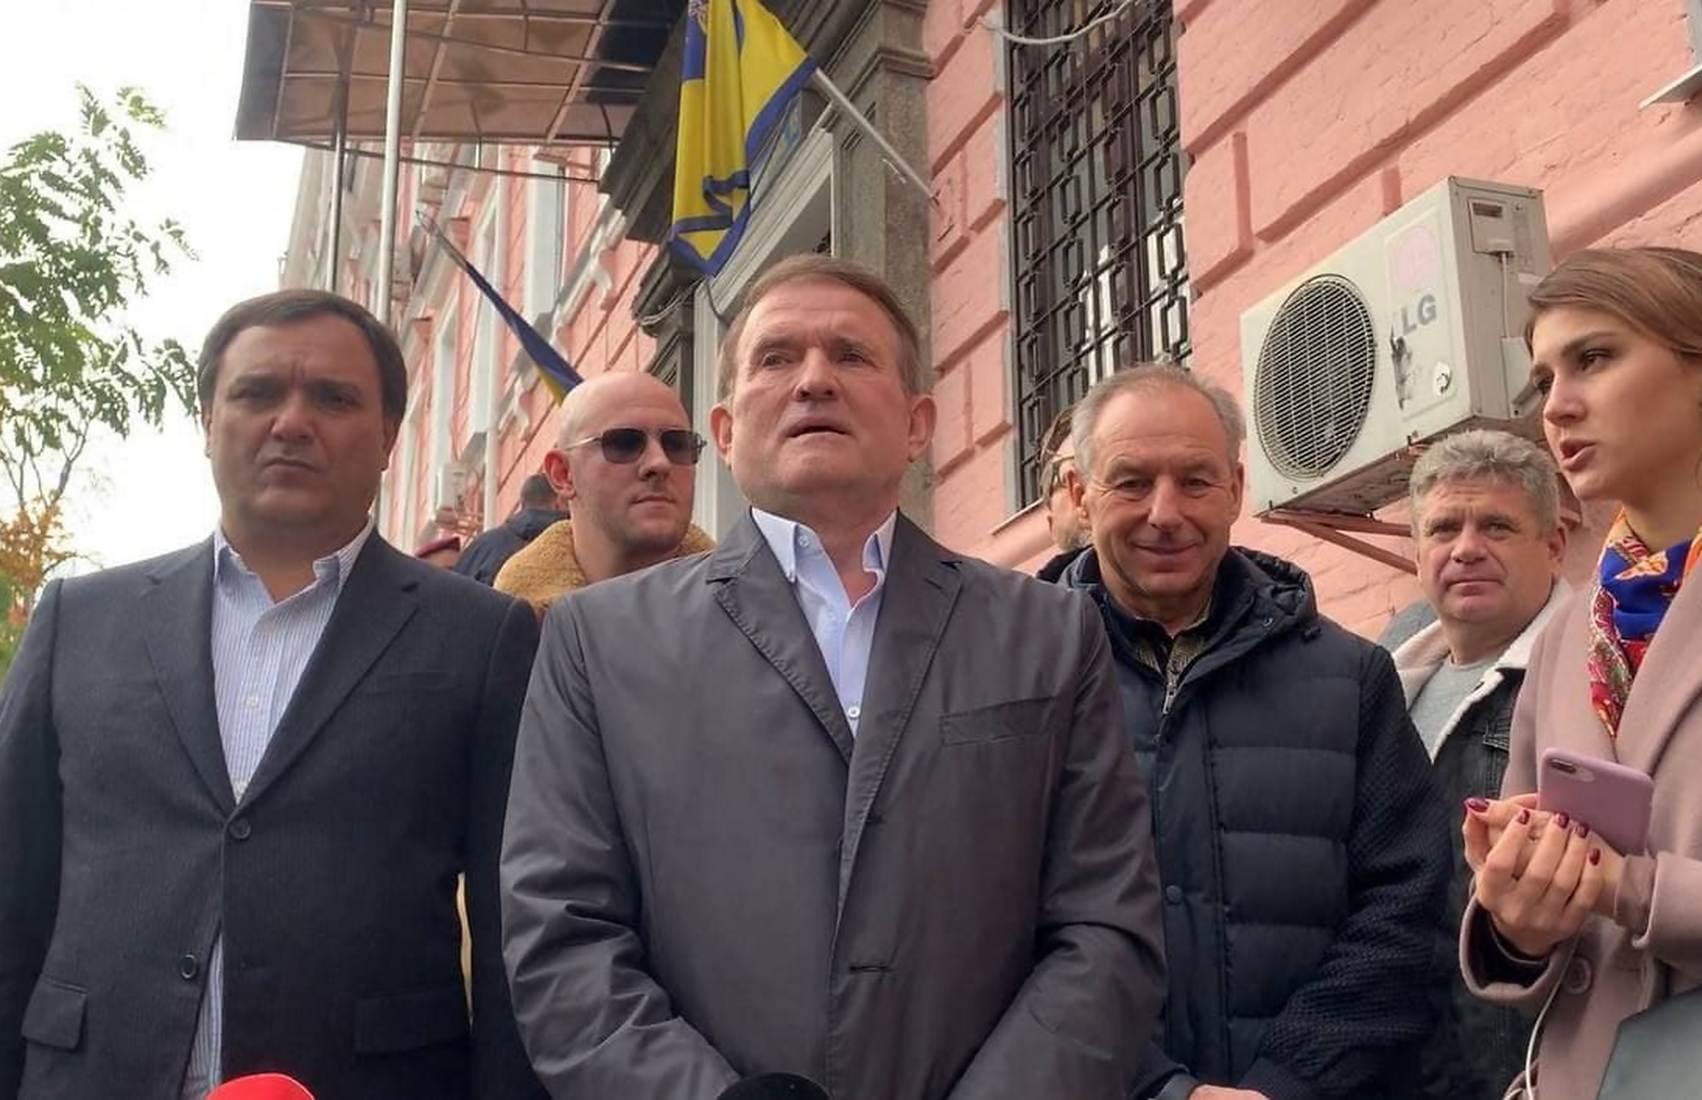 Суд отказал прокуратуре в аресте Медведчука